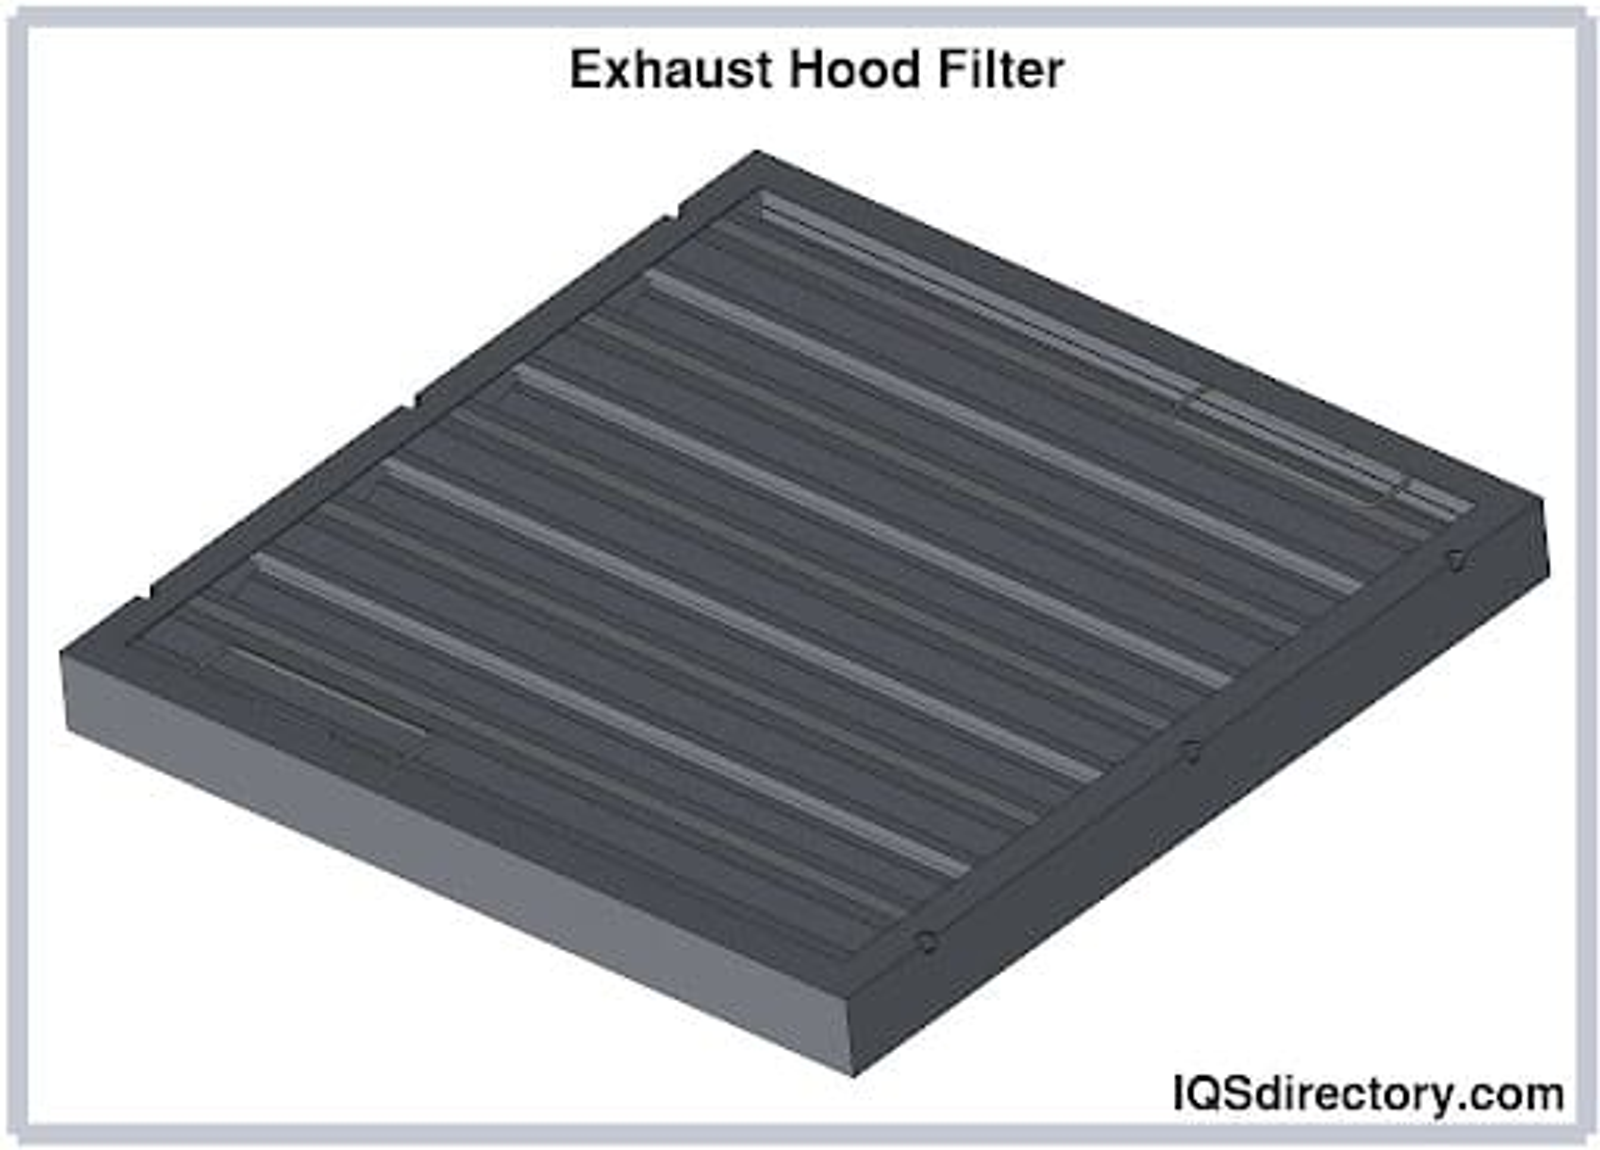 Exhaust Hood Filter